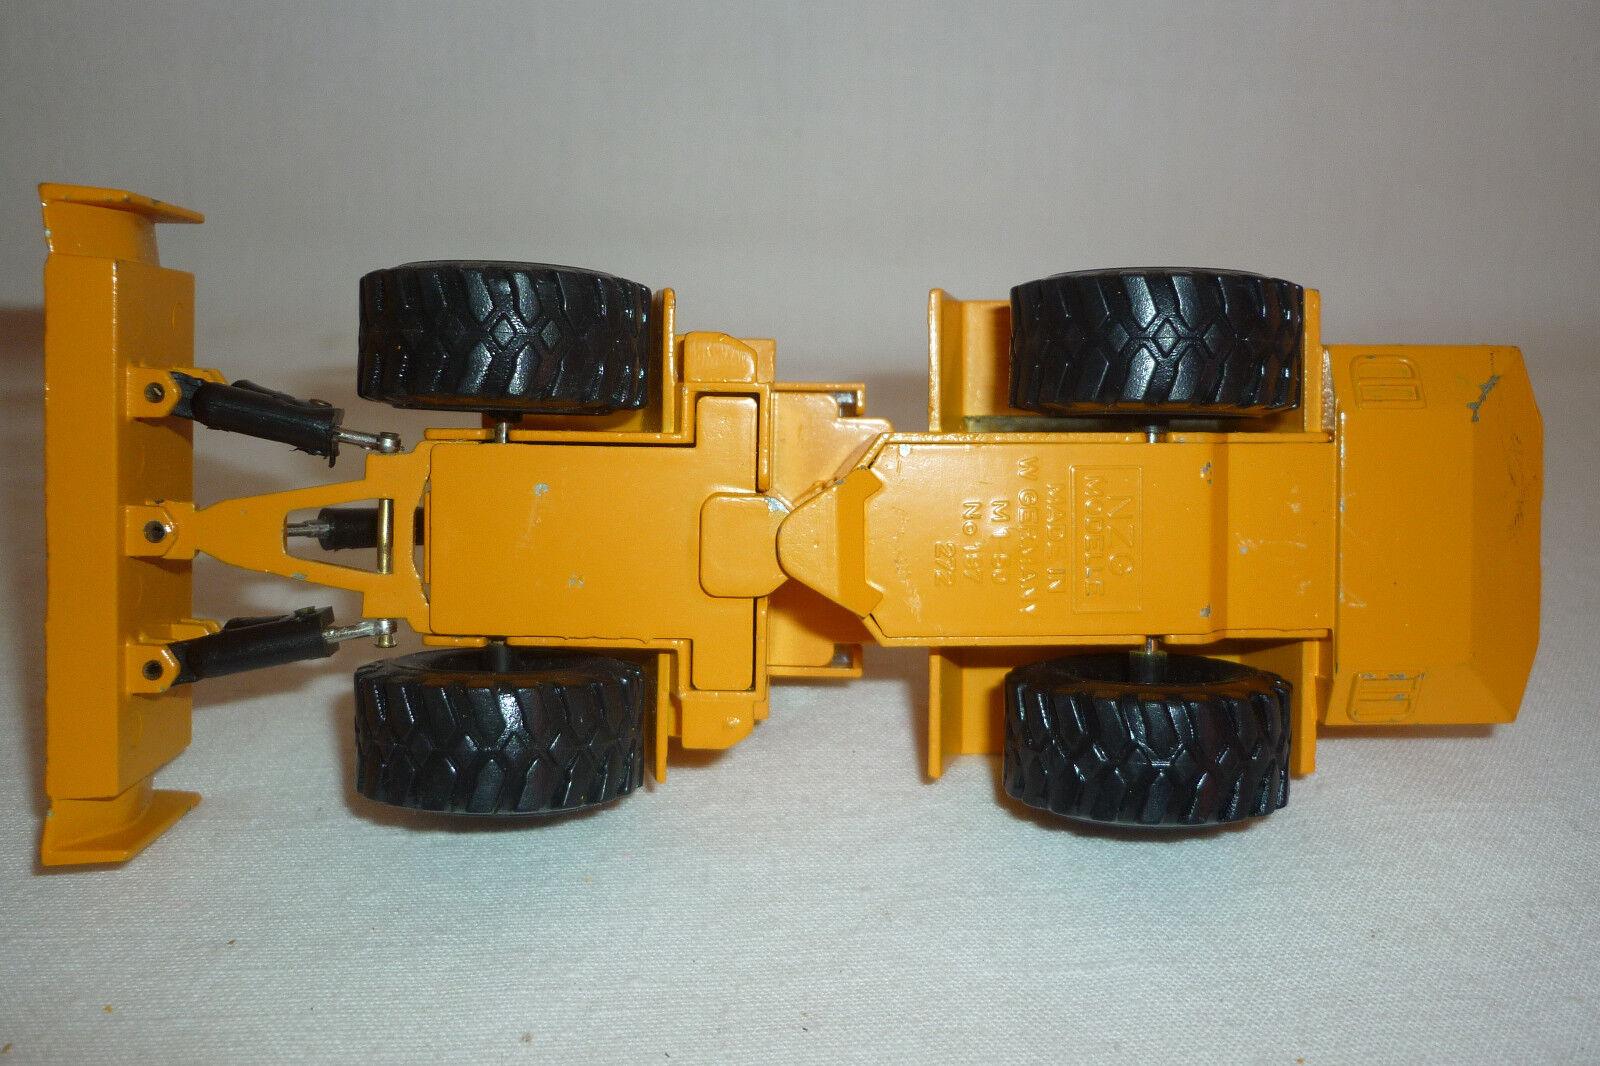 NZG-metal modelo-Zettelmeyer ZD ZD ZD 3000-schwenklader - 1 50 (7.bm-90) 7ac308